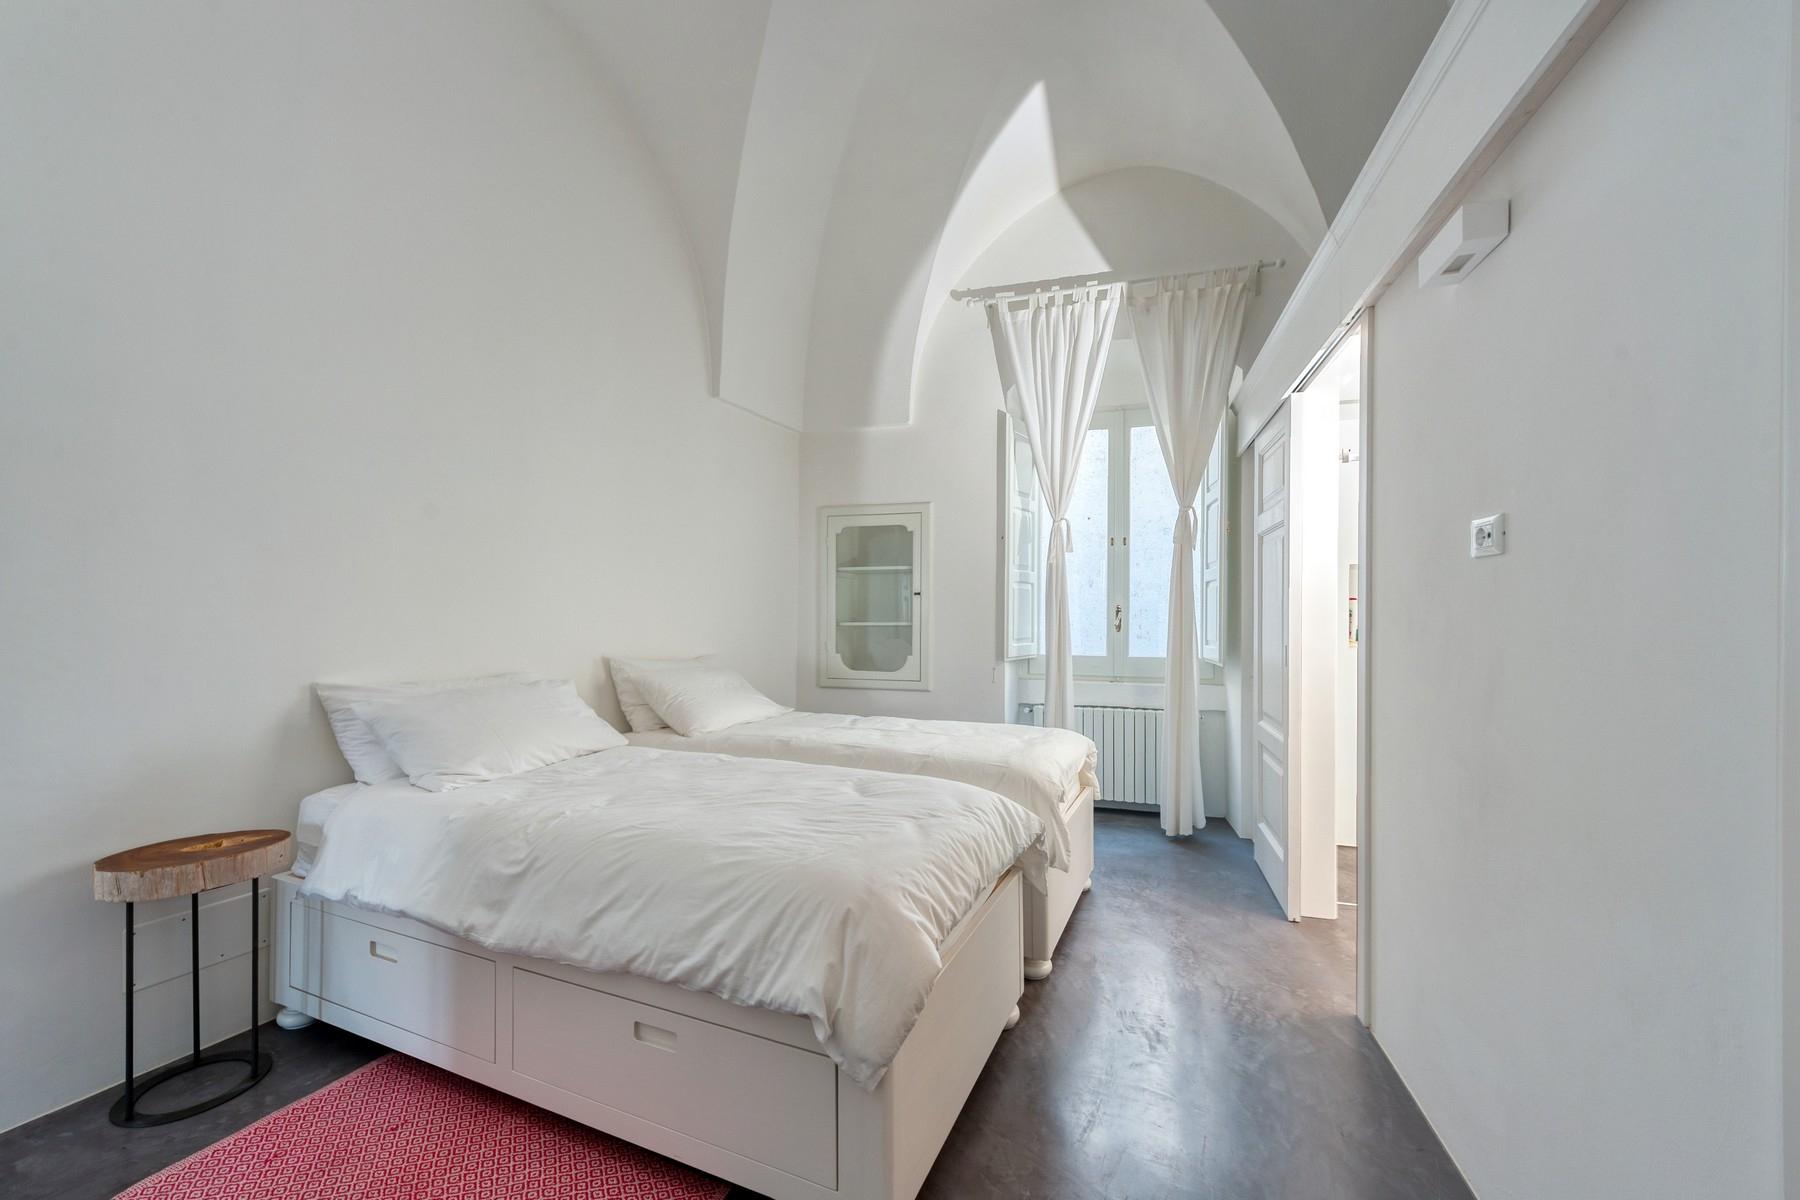 Appartamento in Vendita a Ostuni: 5 locali, 265 mq - Foto 9